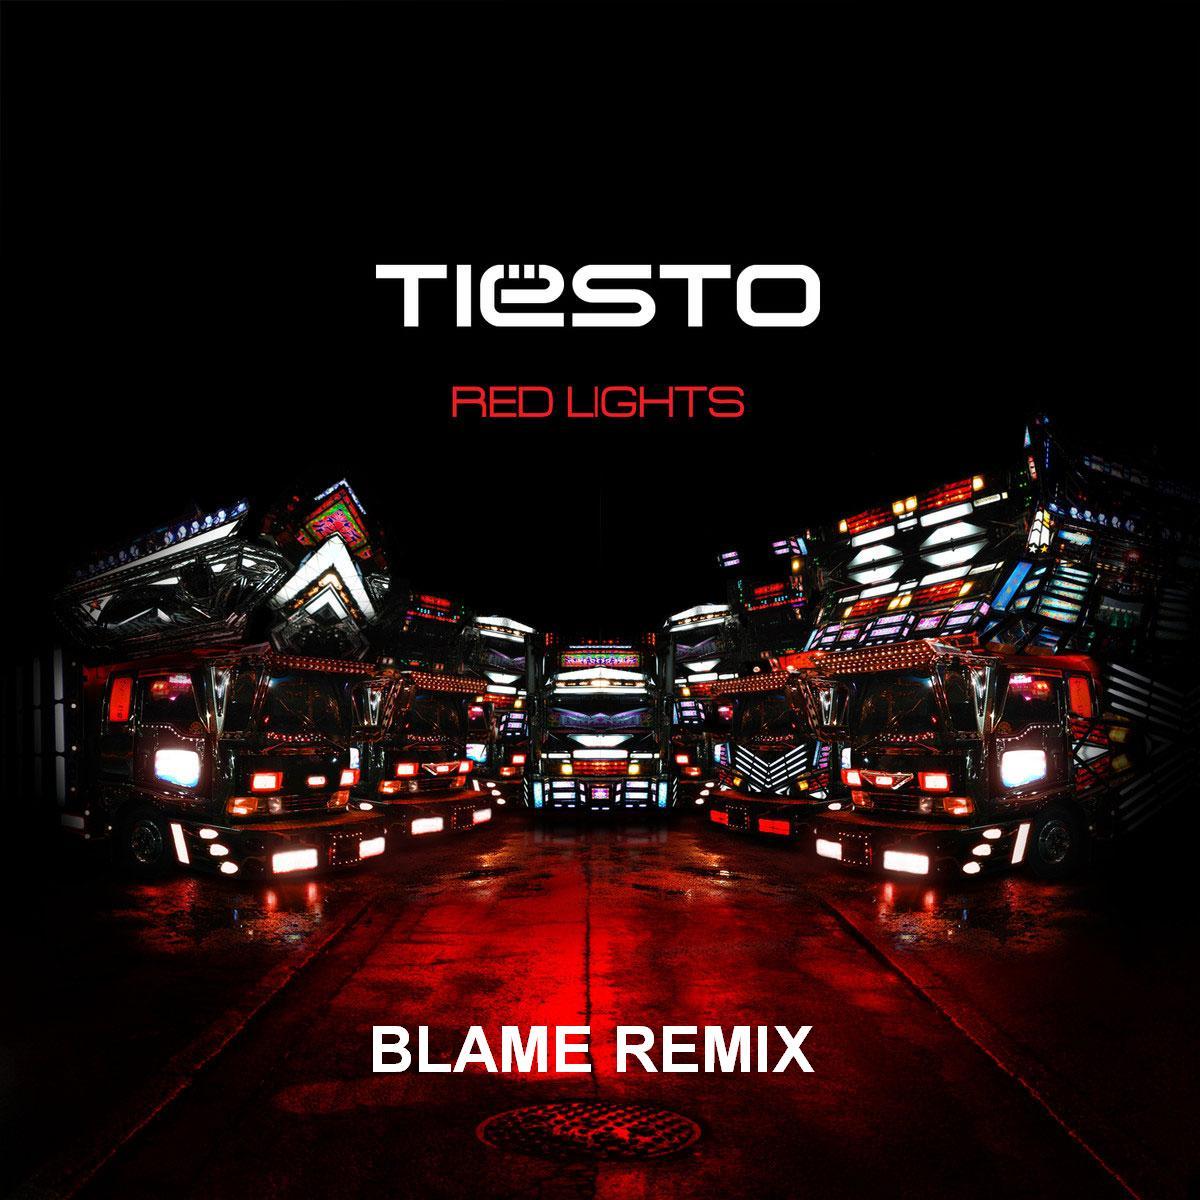 Tiesto - Red Lights (Blame Remix)